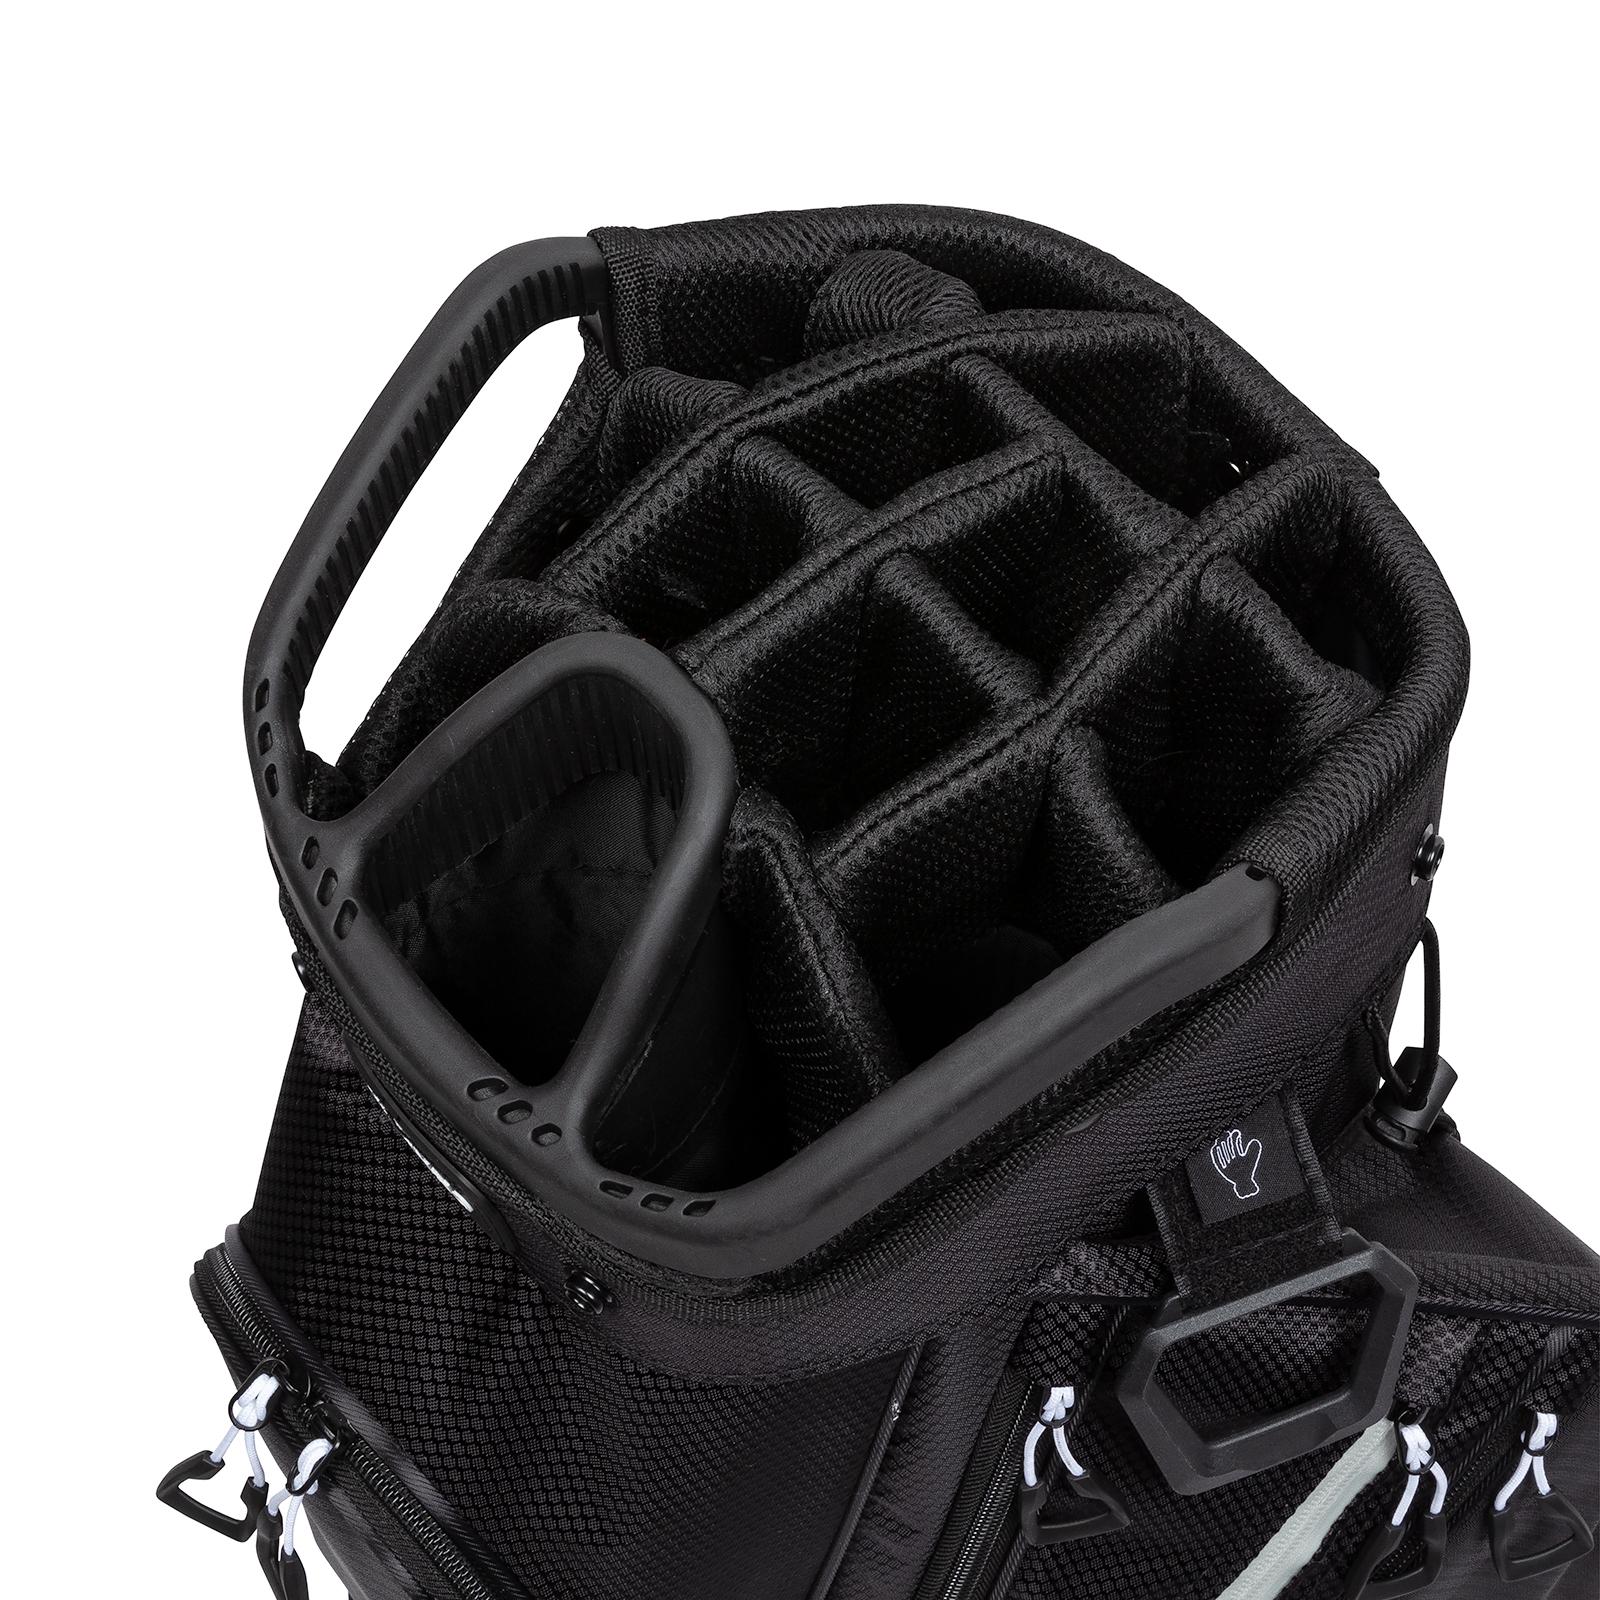 Cartbag in sportlichem Design